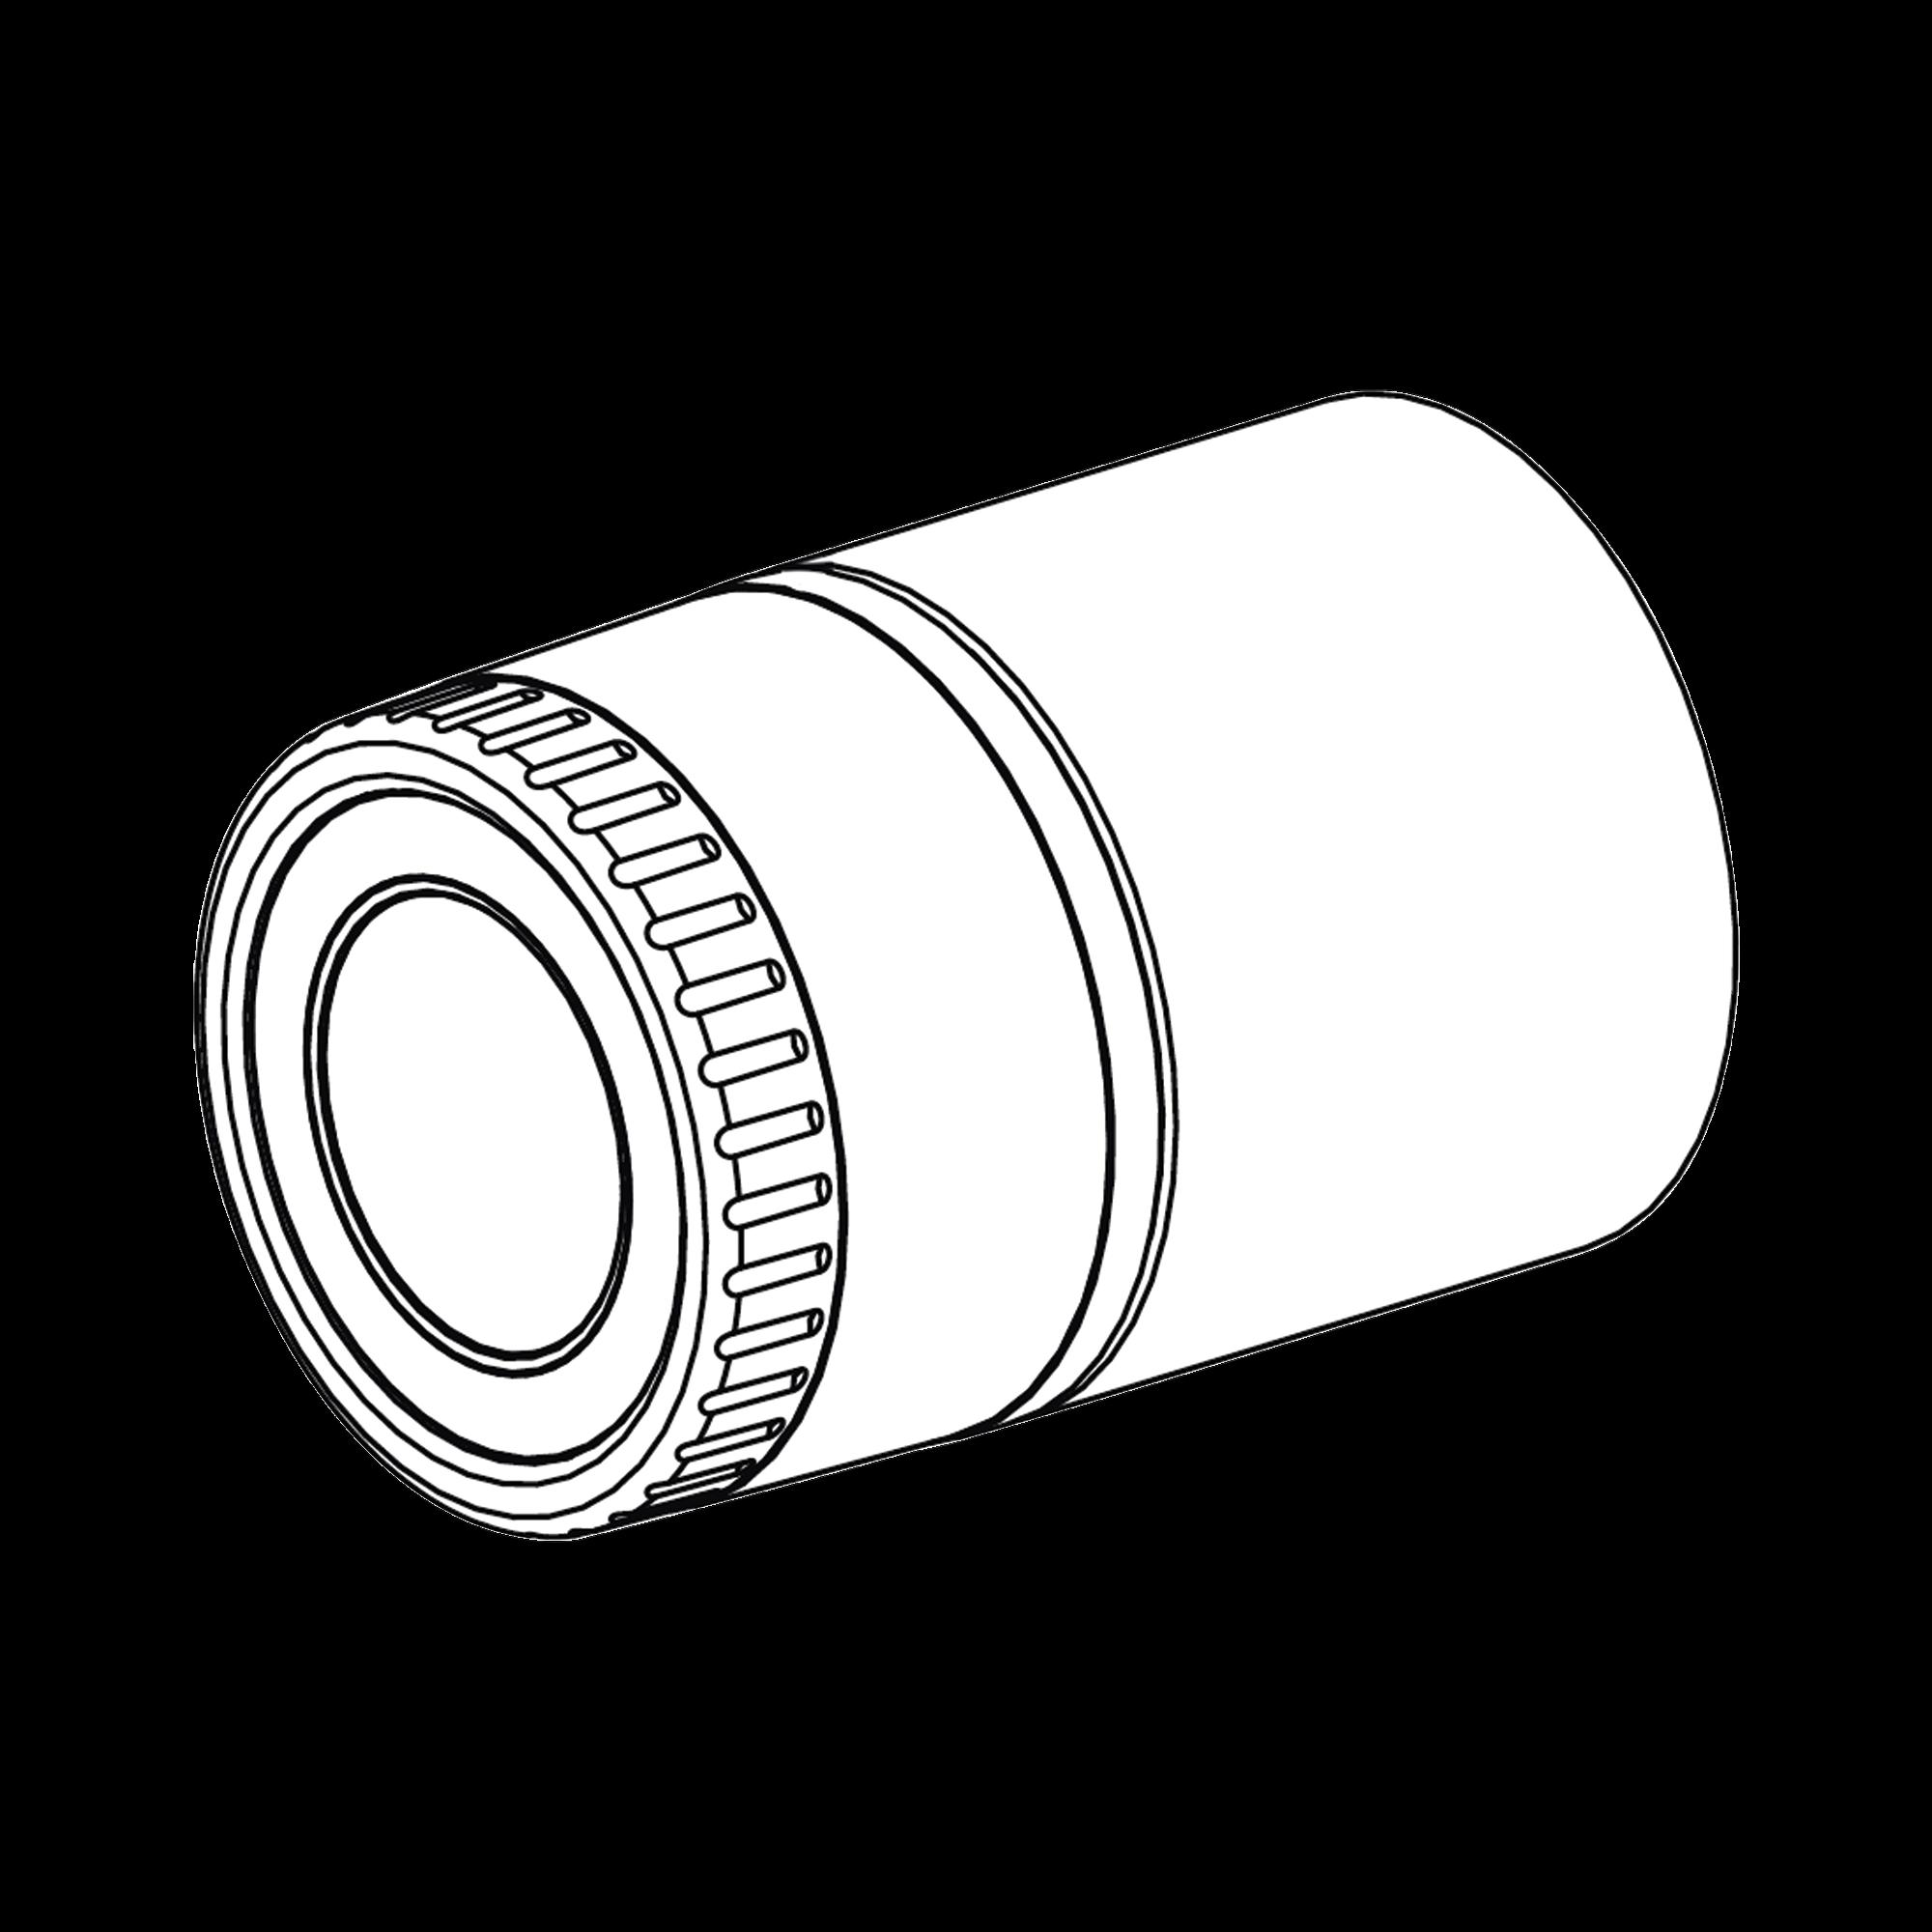 Cubierta frontal para camaras tipo IP bala Wisenet